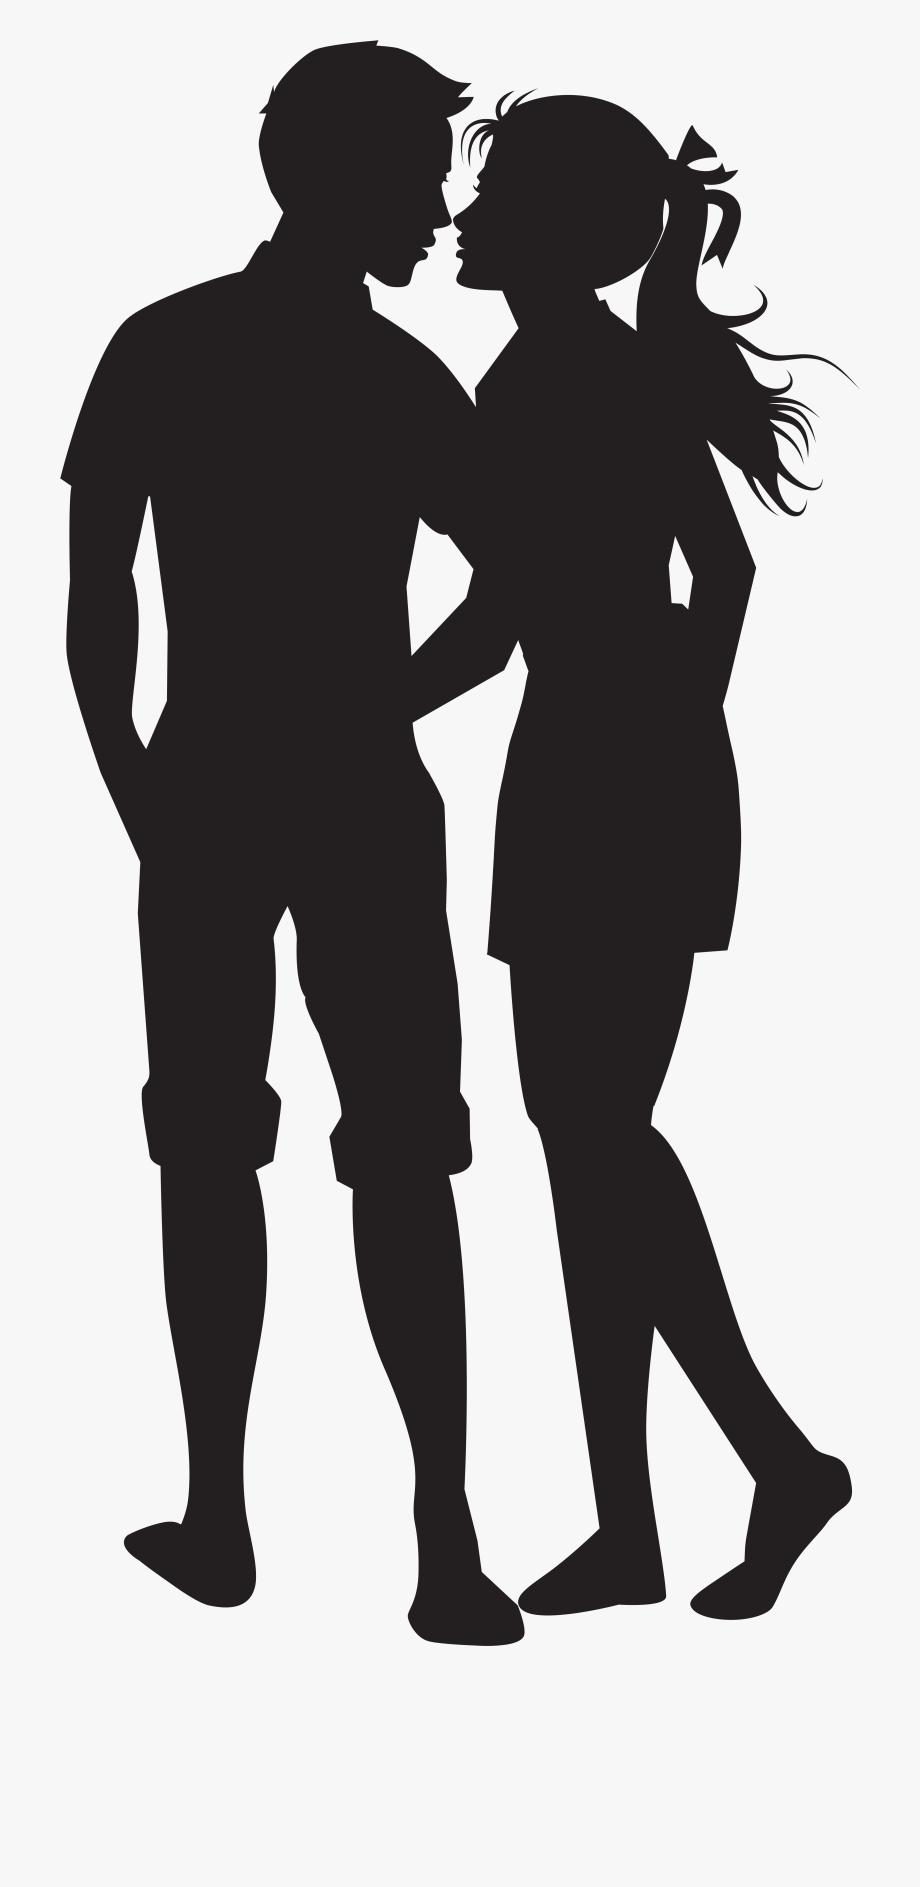 727,05kb Couple Clipart Silhouette.